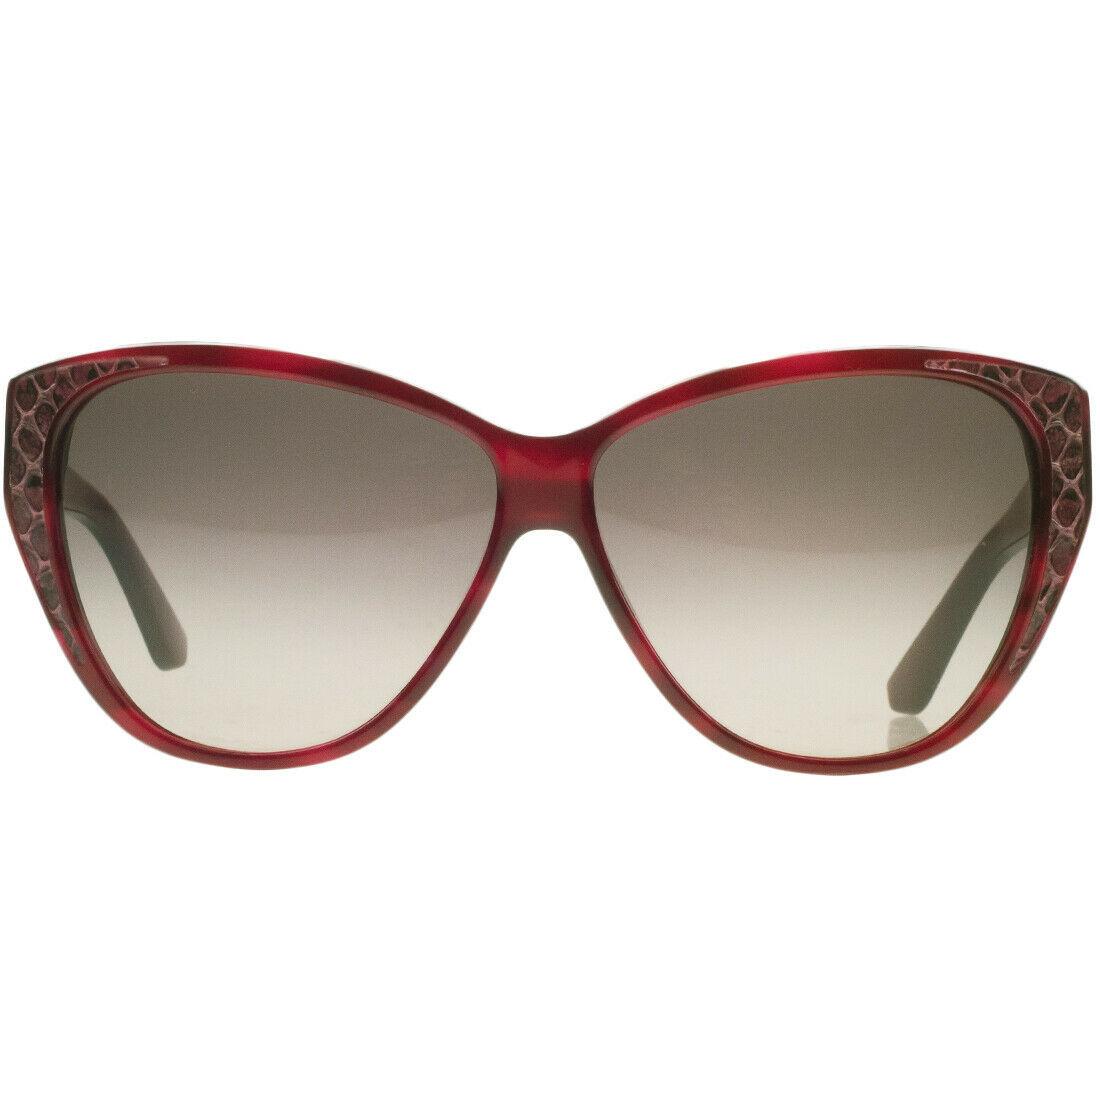 Salvatore Ferragamo SF711 616 Striped Red Cat Eye Leather Womens Sunglasses 59mm